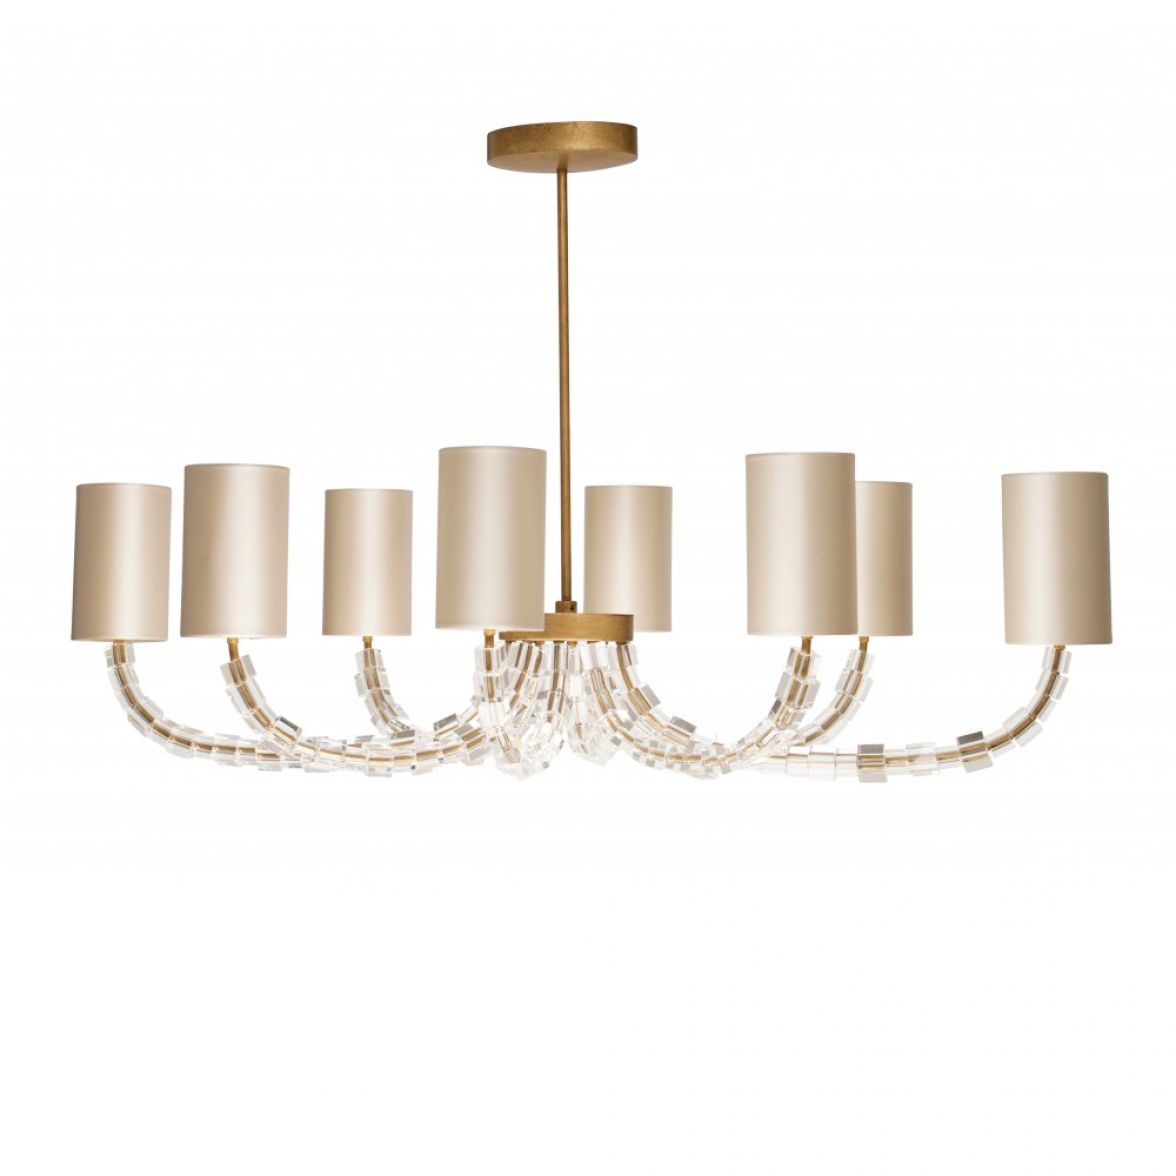 Oval Lartigue chandelier